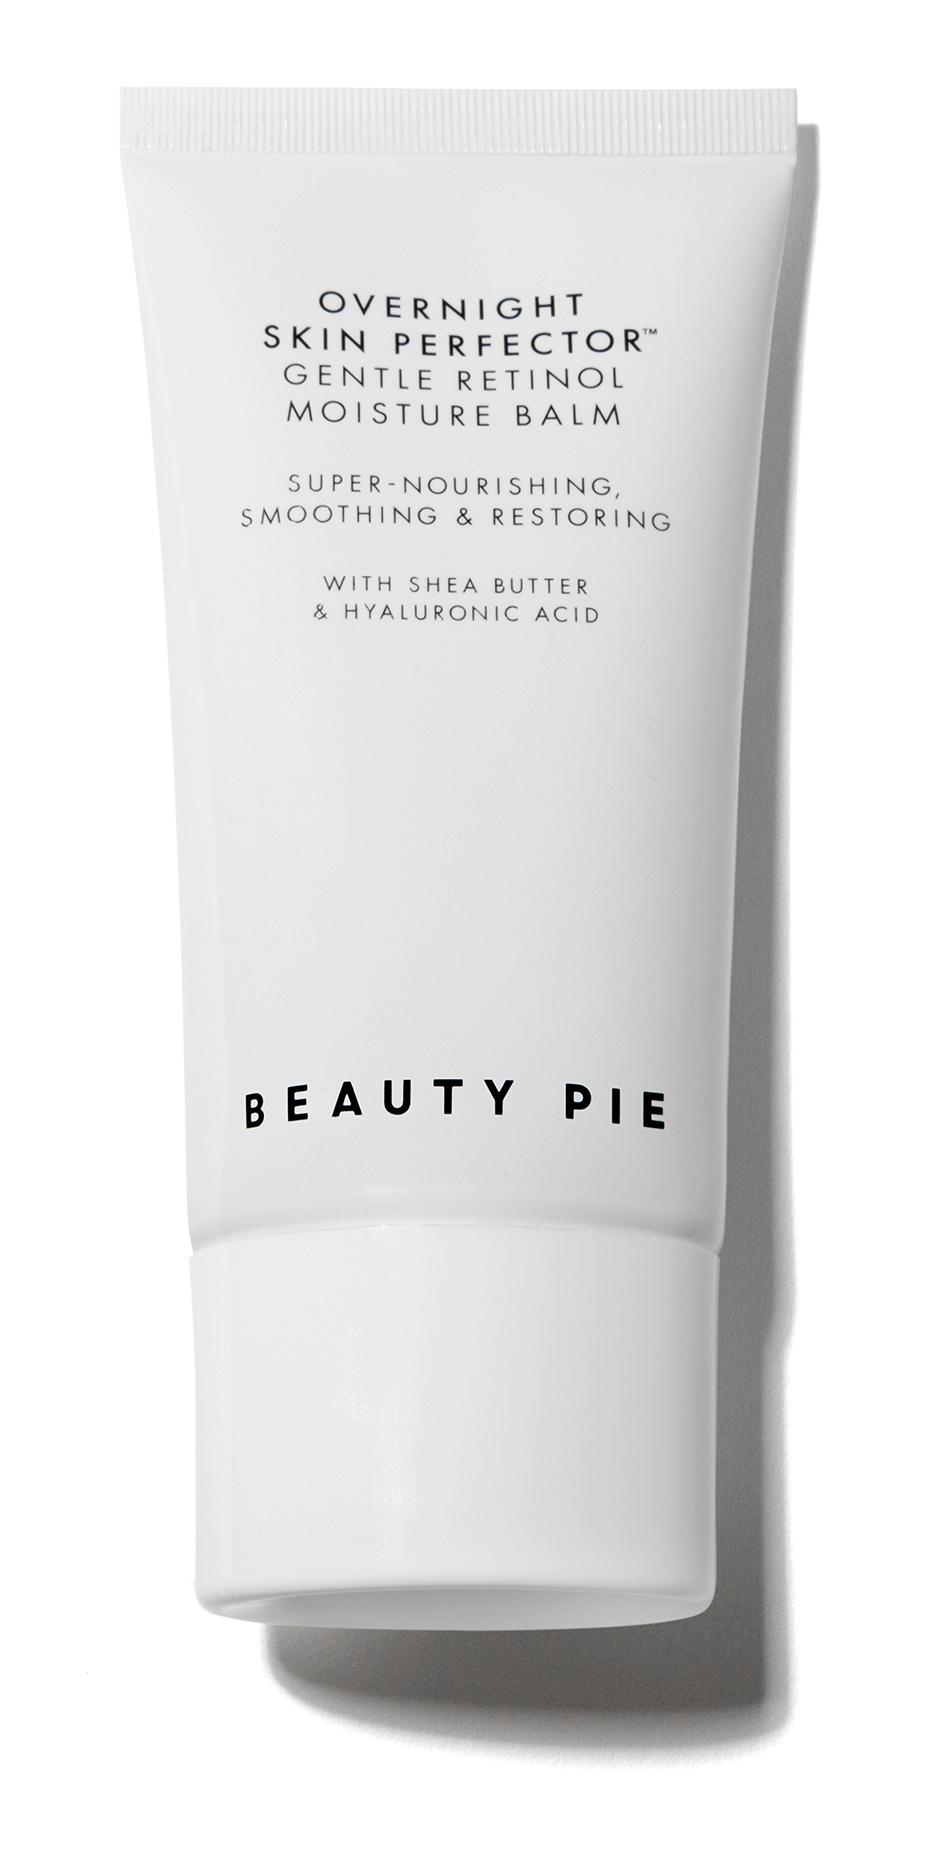 Beauty Pie Overnight Skin Perfector